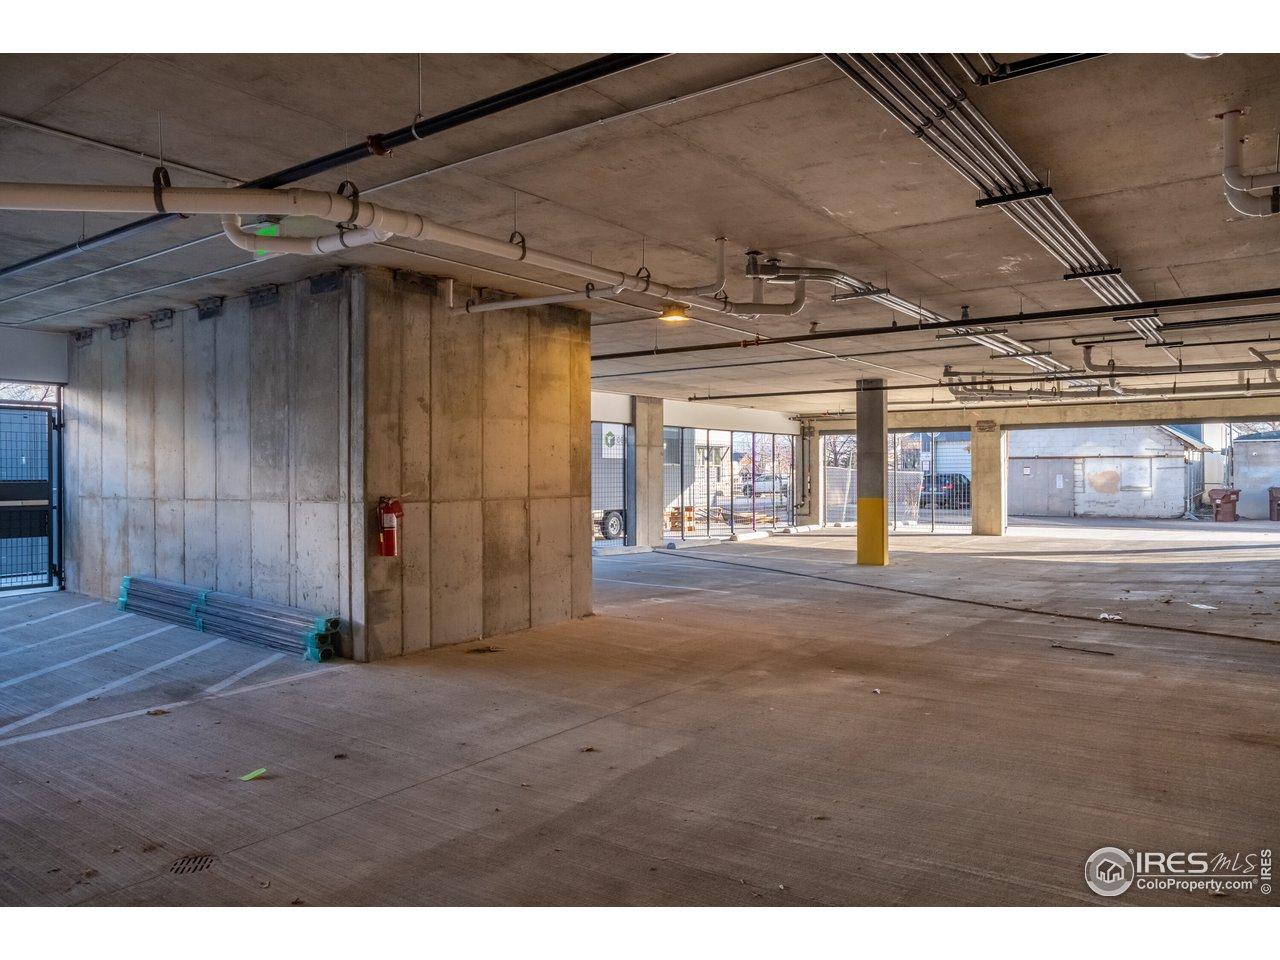 Secure Open Air Parking Garage